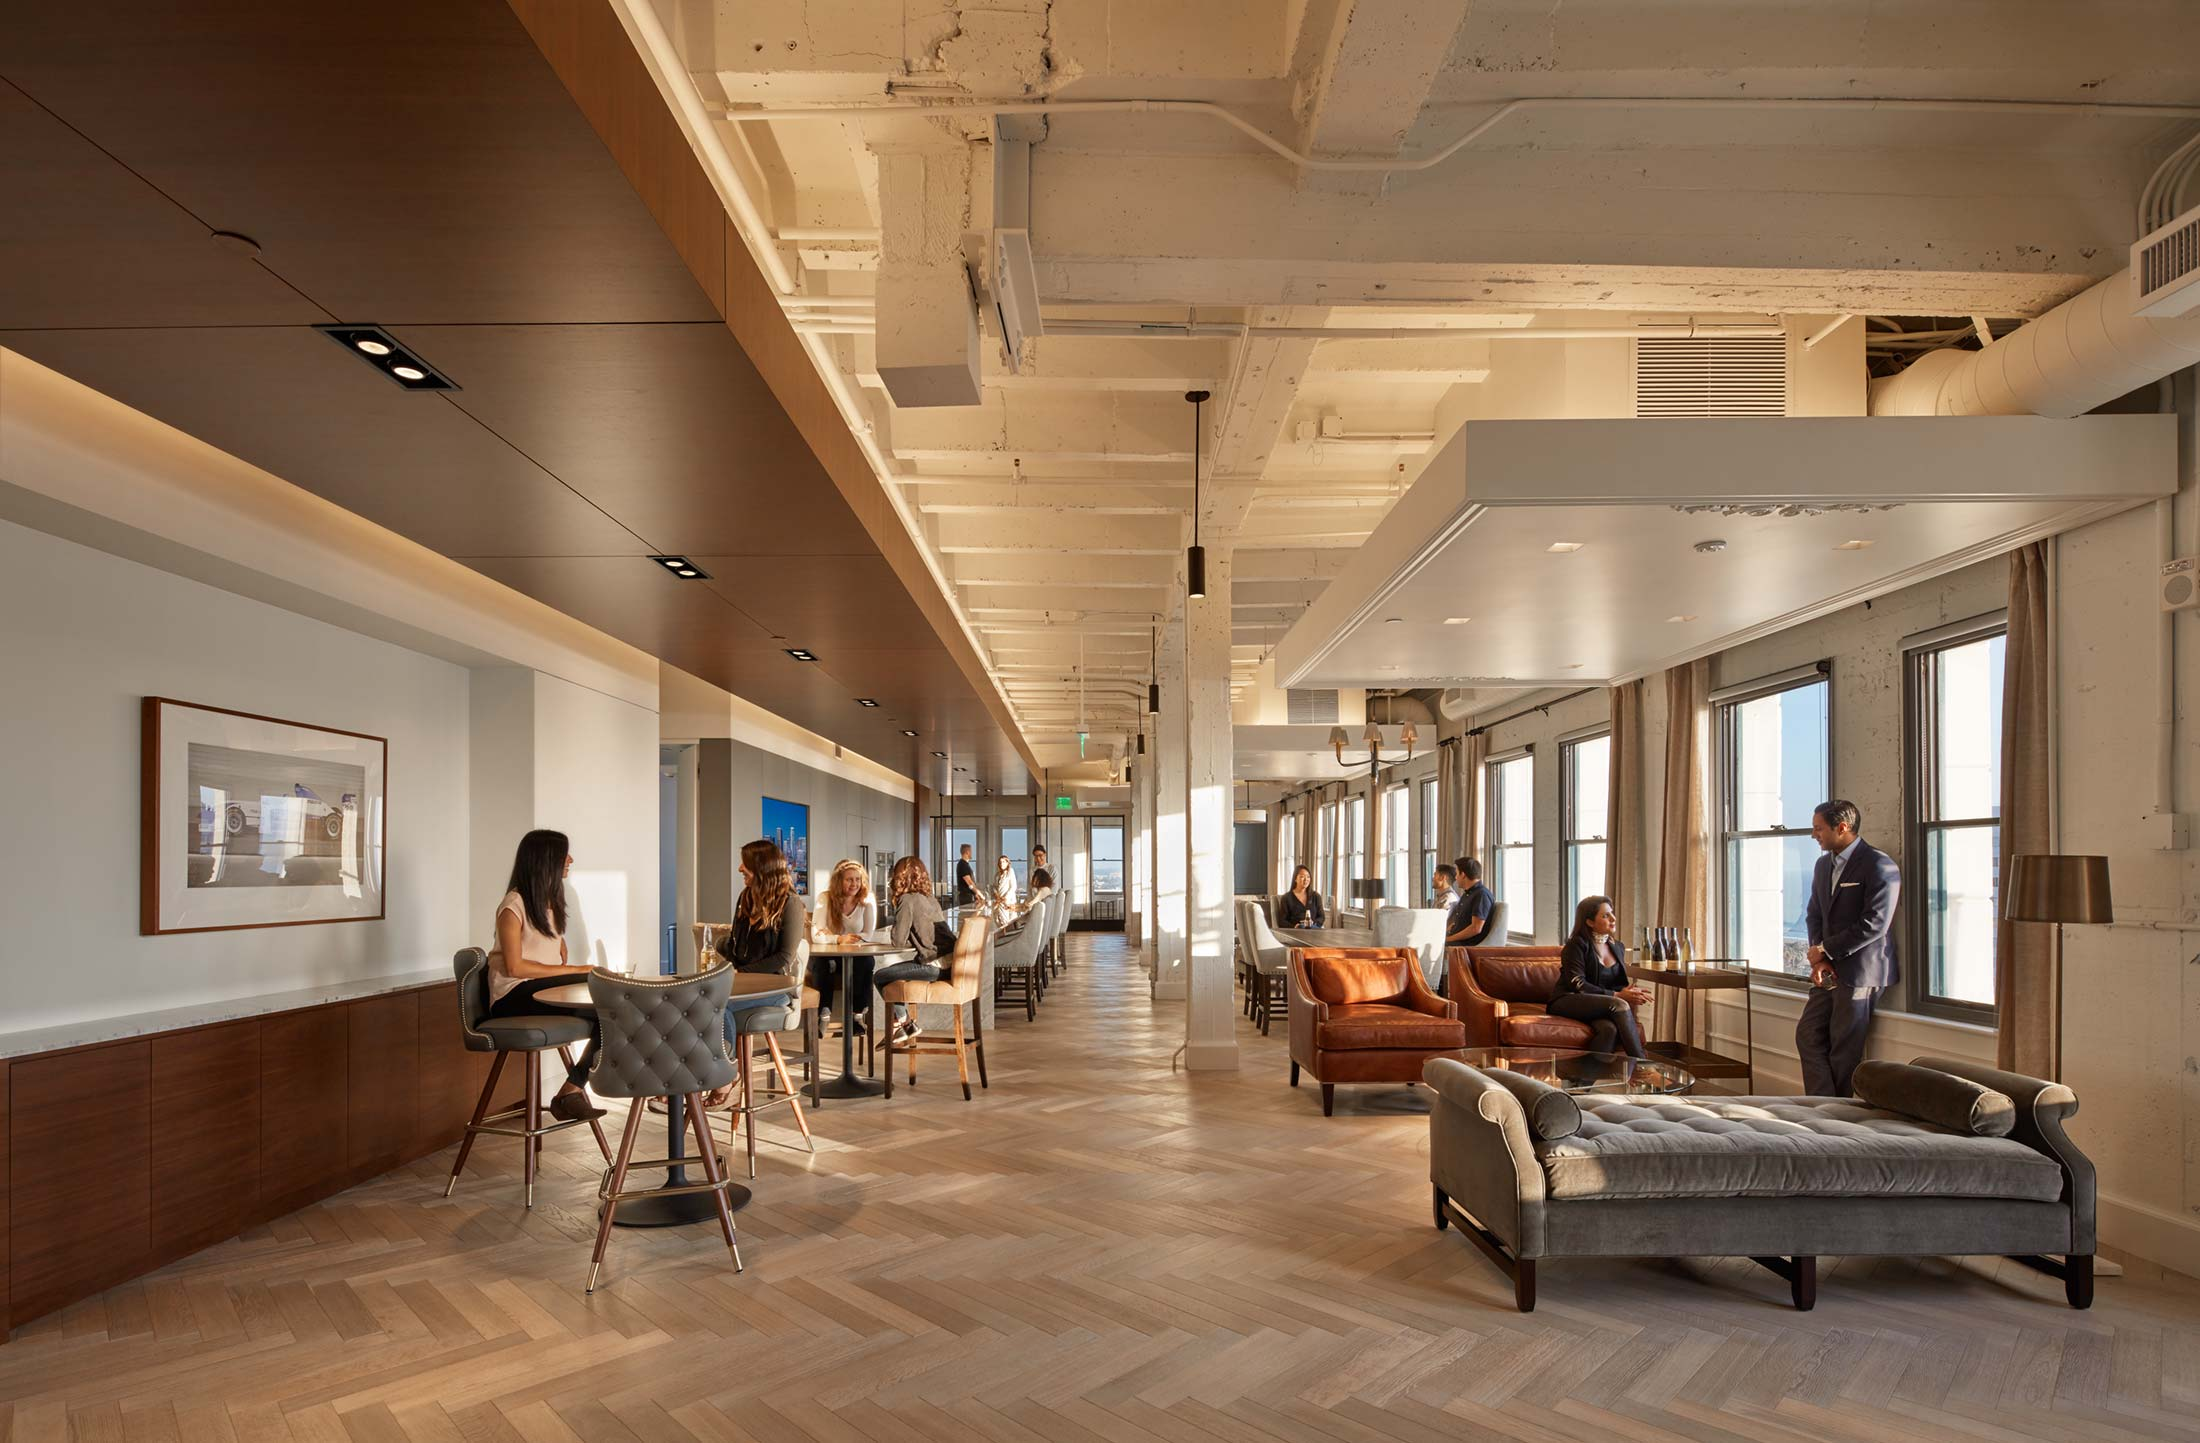 modern-architecture-commercial-interiors-office-california-shubindonaldson-truecar-clocktower-05